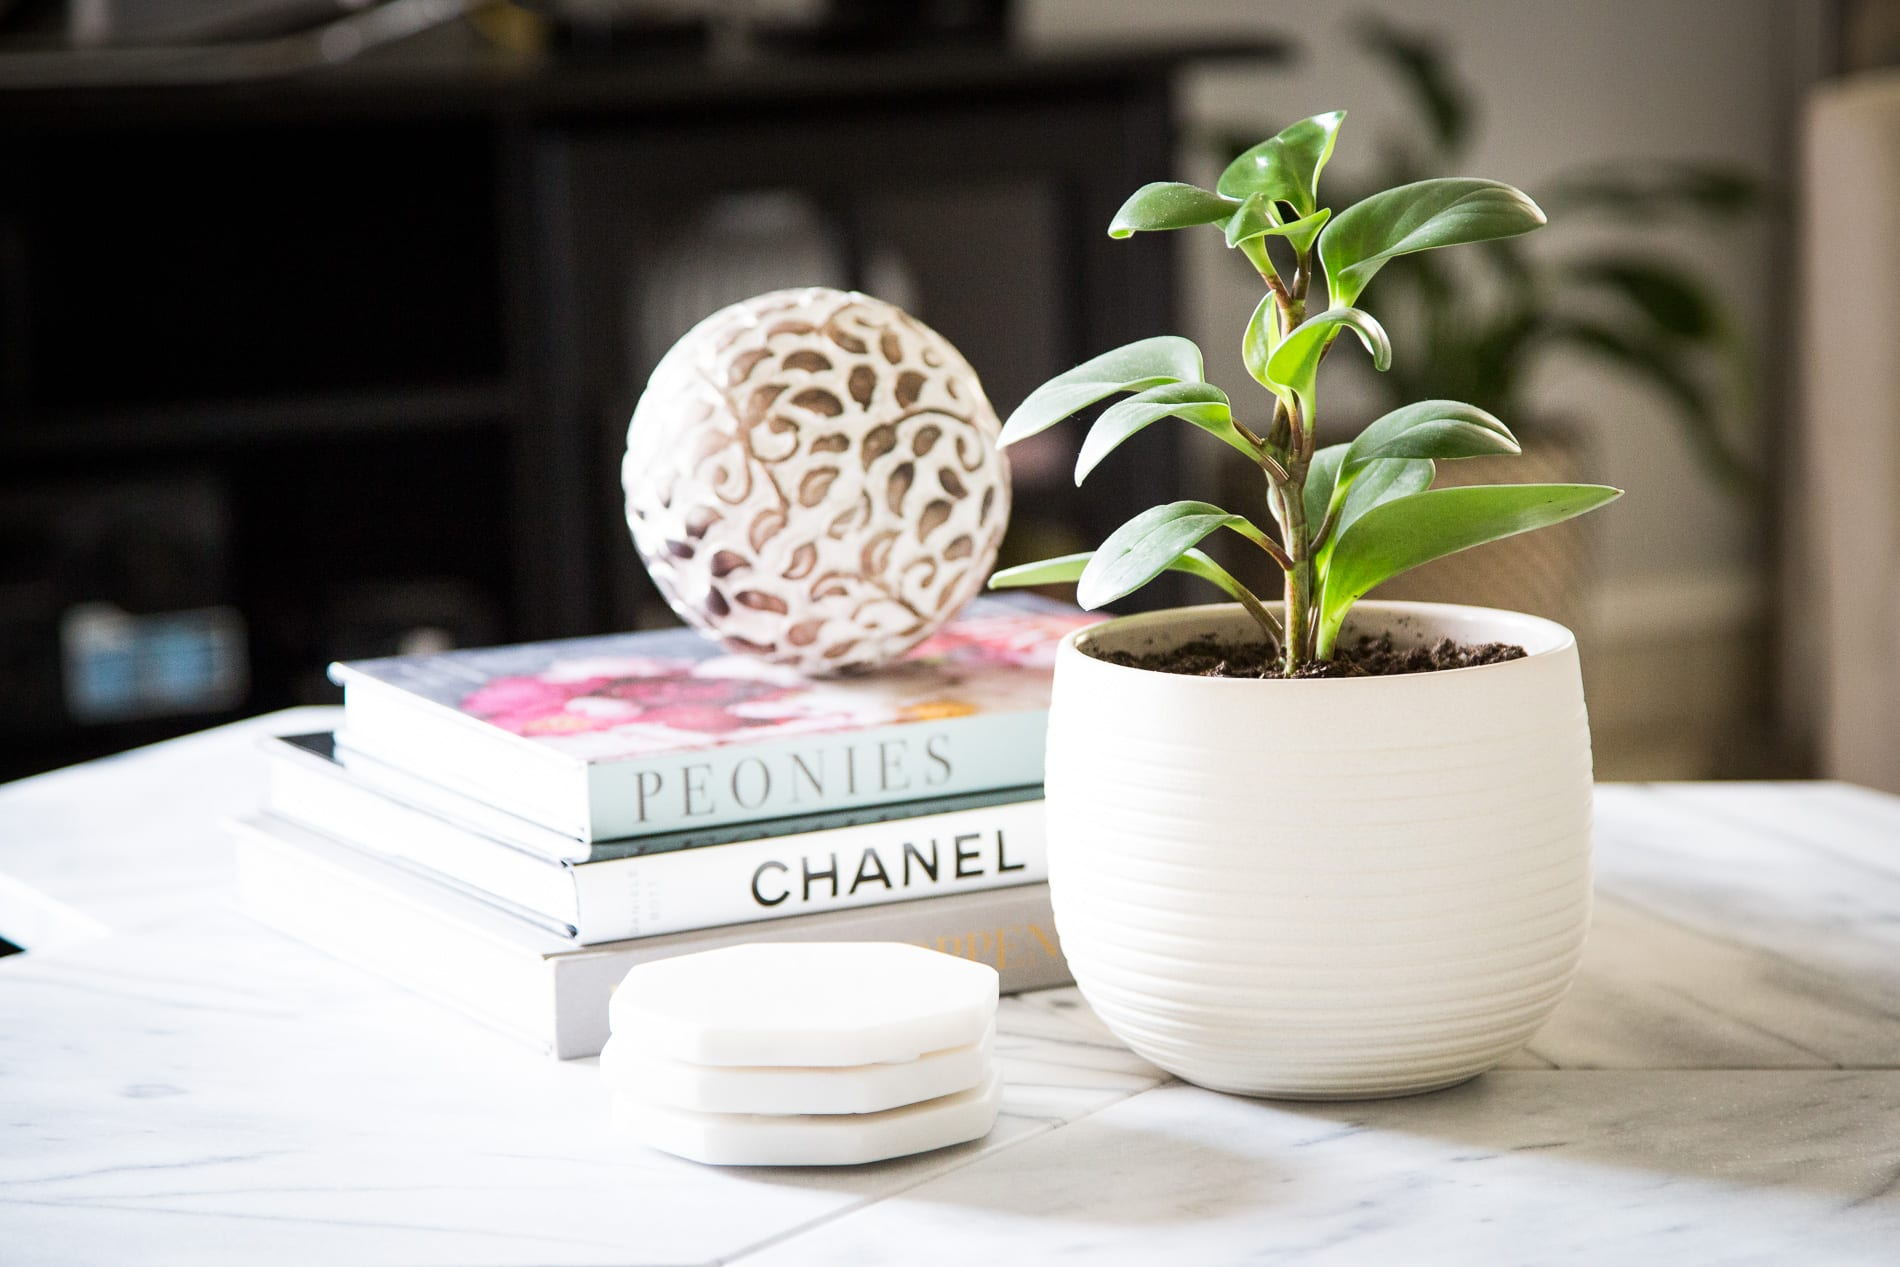 25 Beautiful Stylish Coffee Table Books The Design Souk